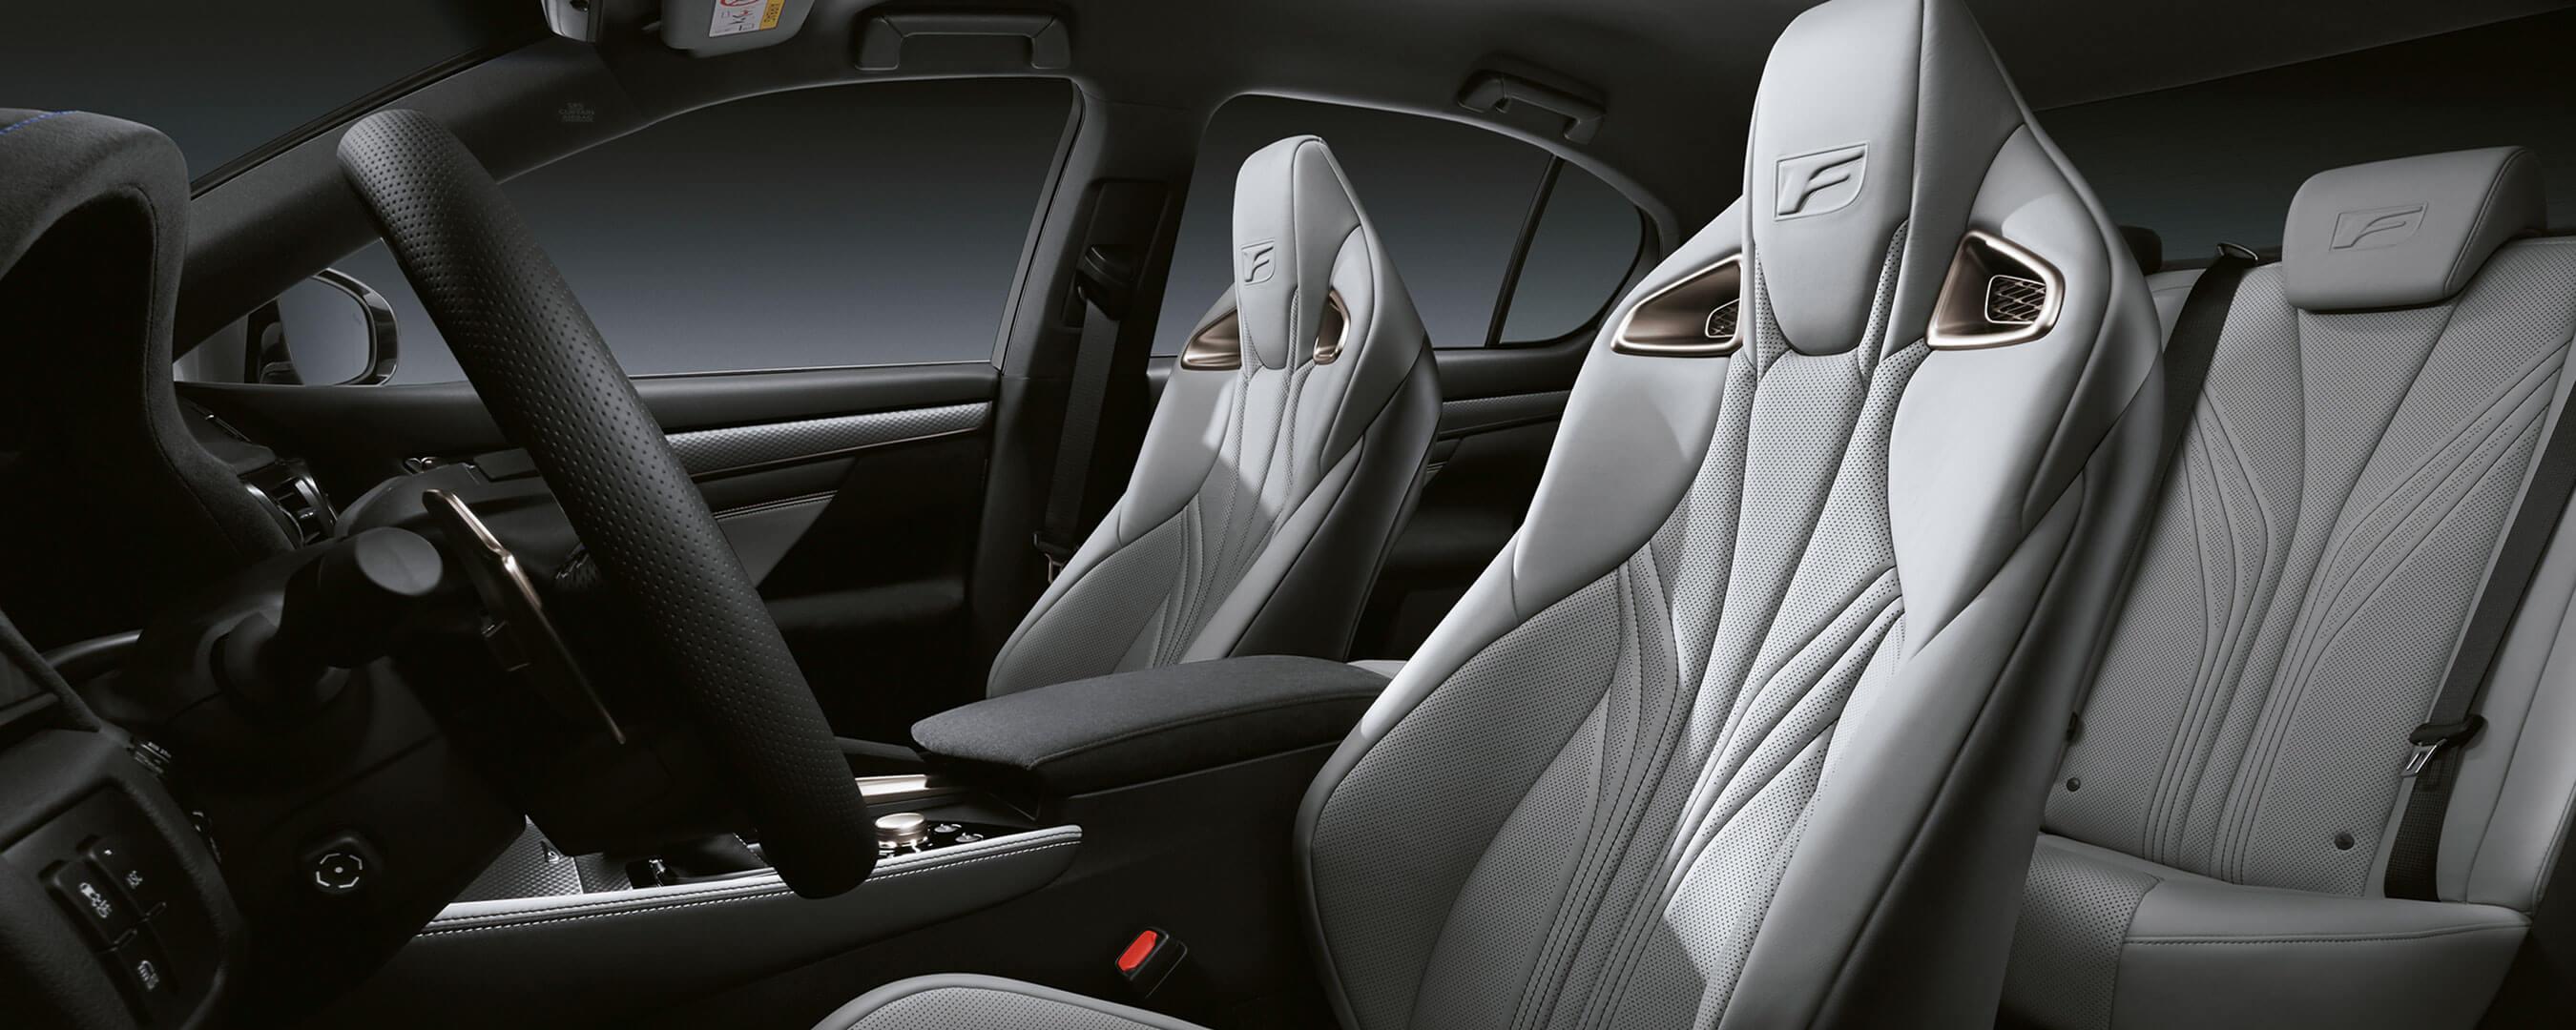 2017 lexus gs f experience hero interior back